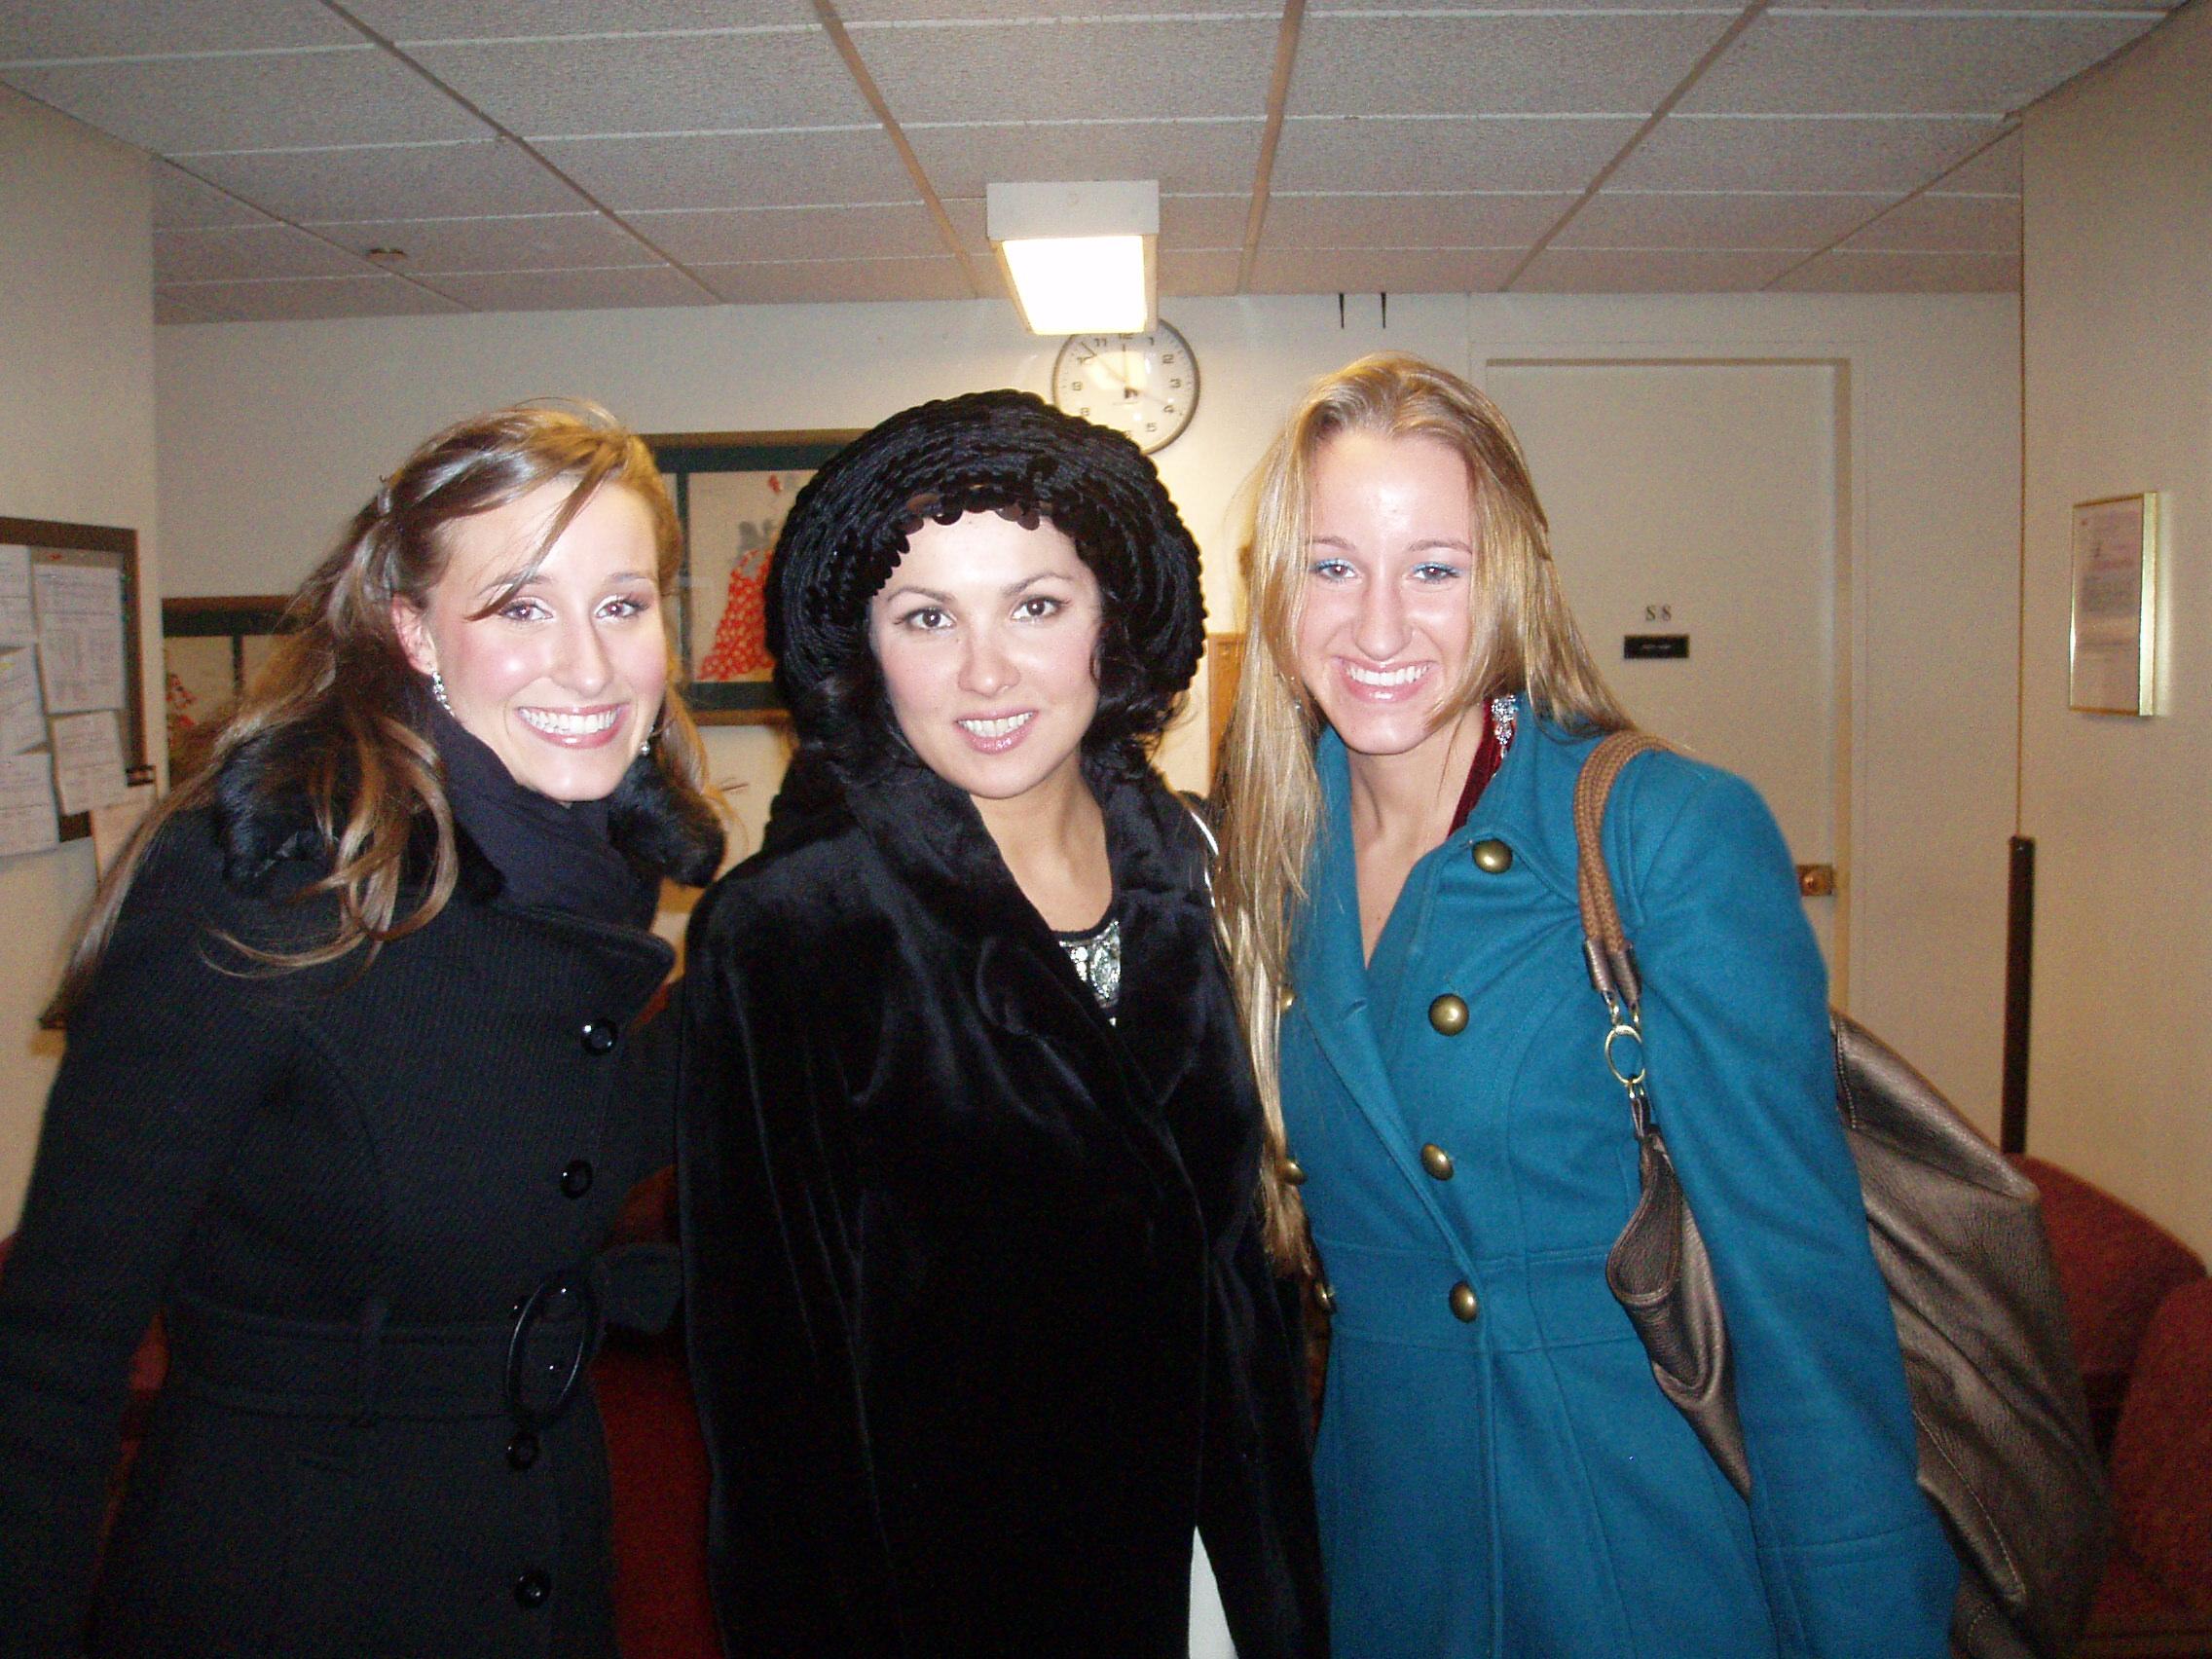 Lauren ad her sister with Anna Netrebko